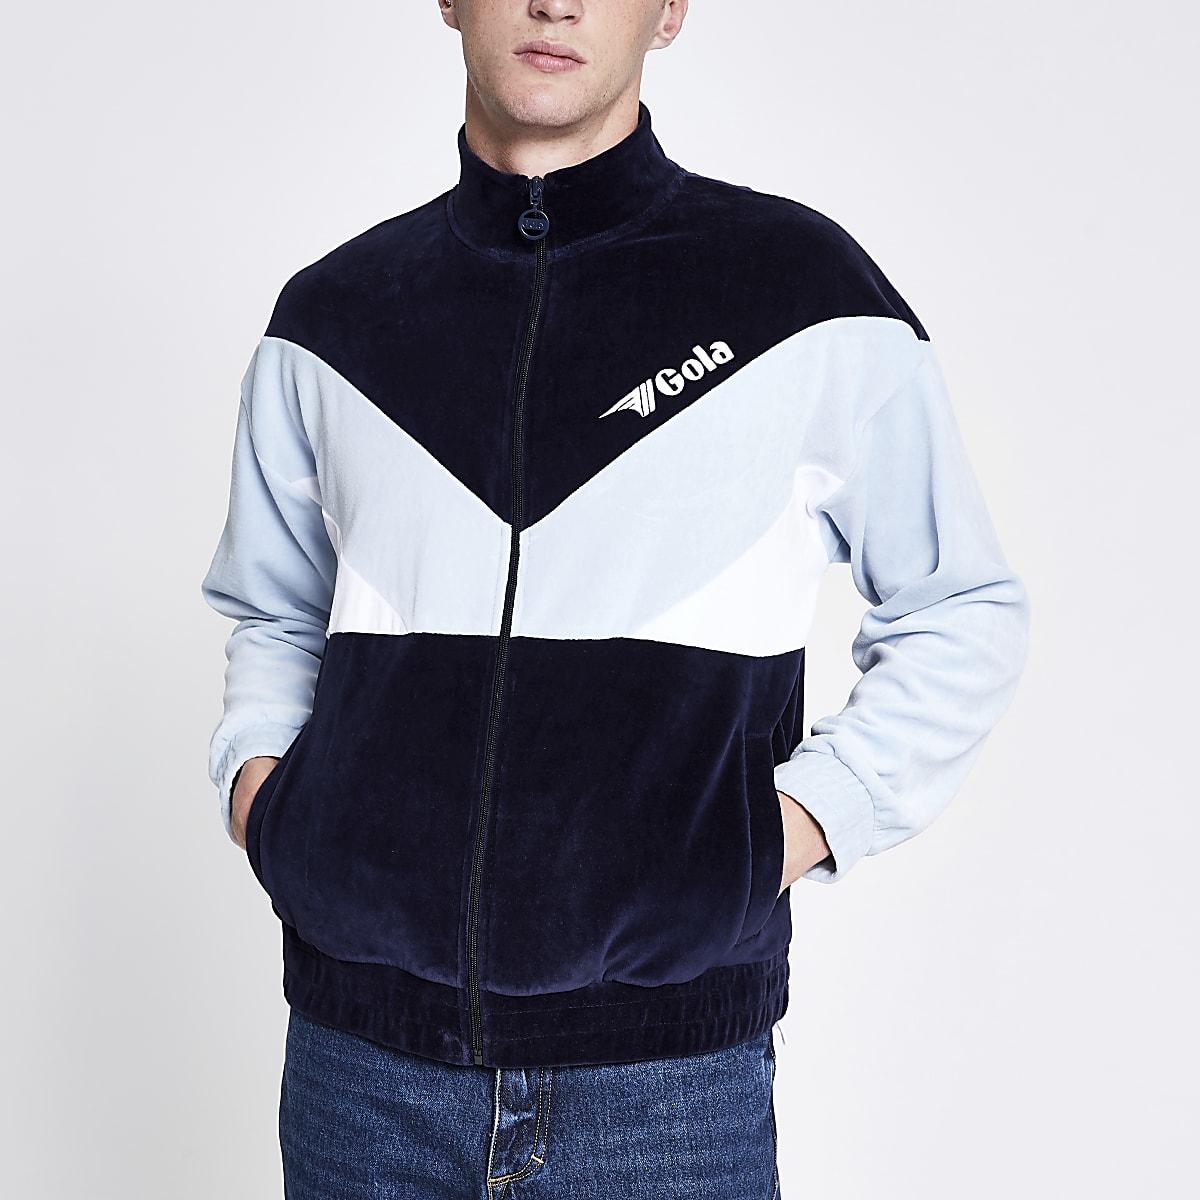 Gola blue zip track top